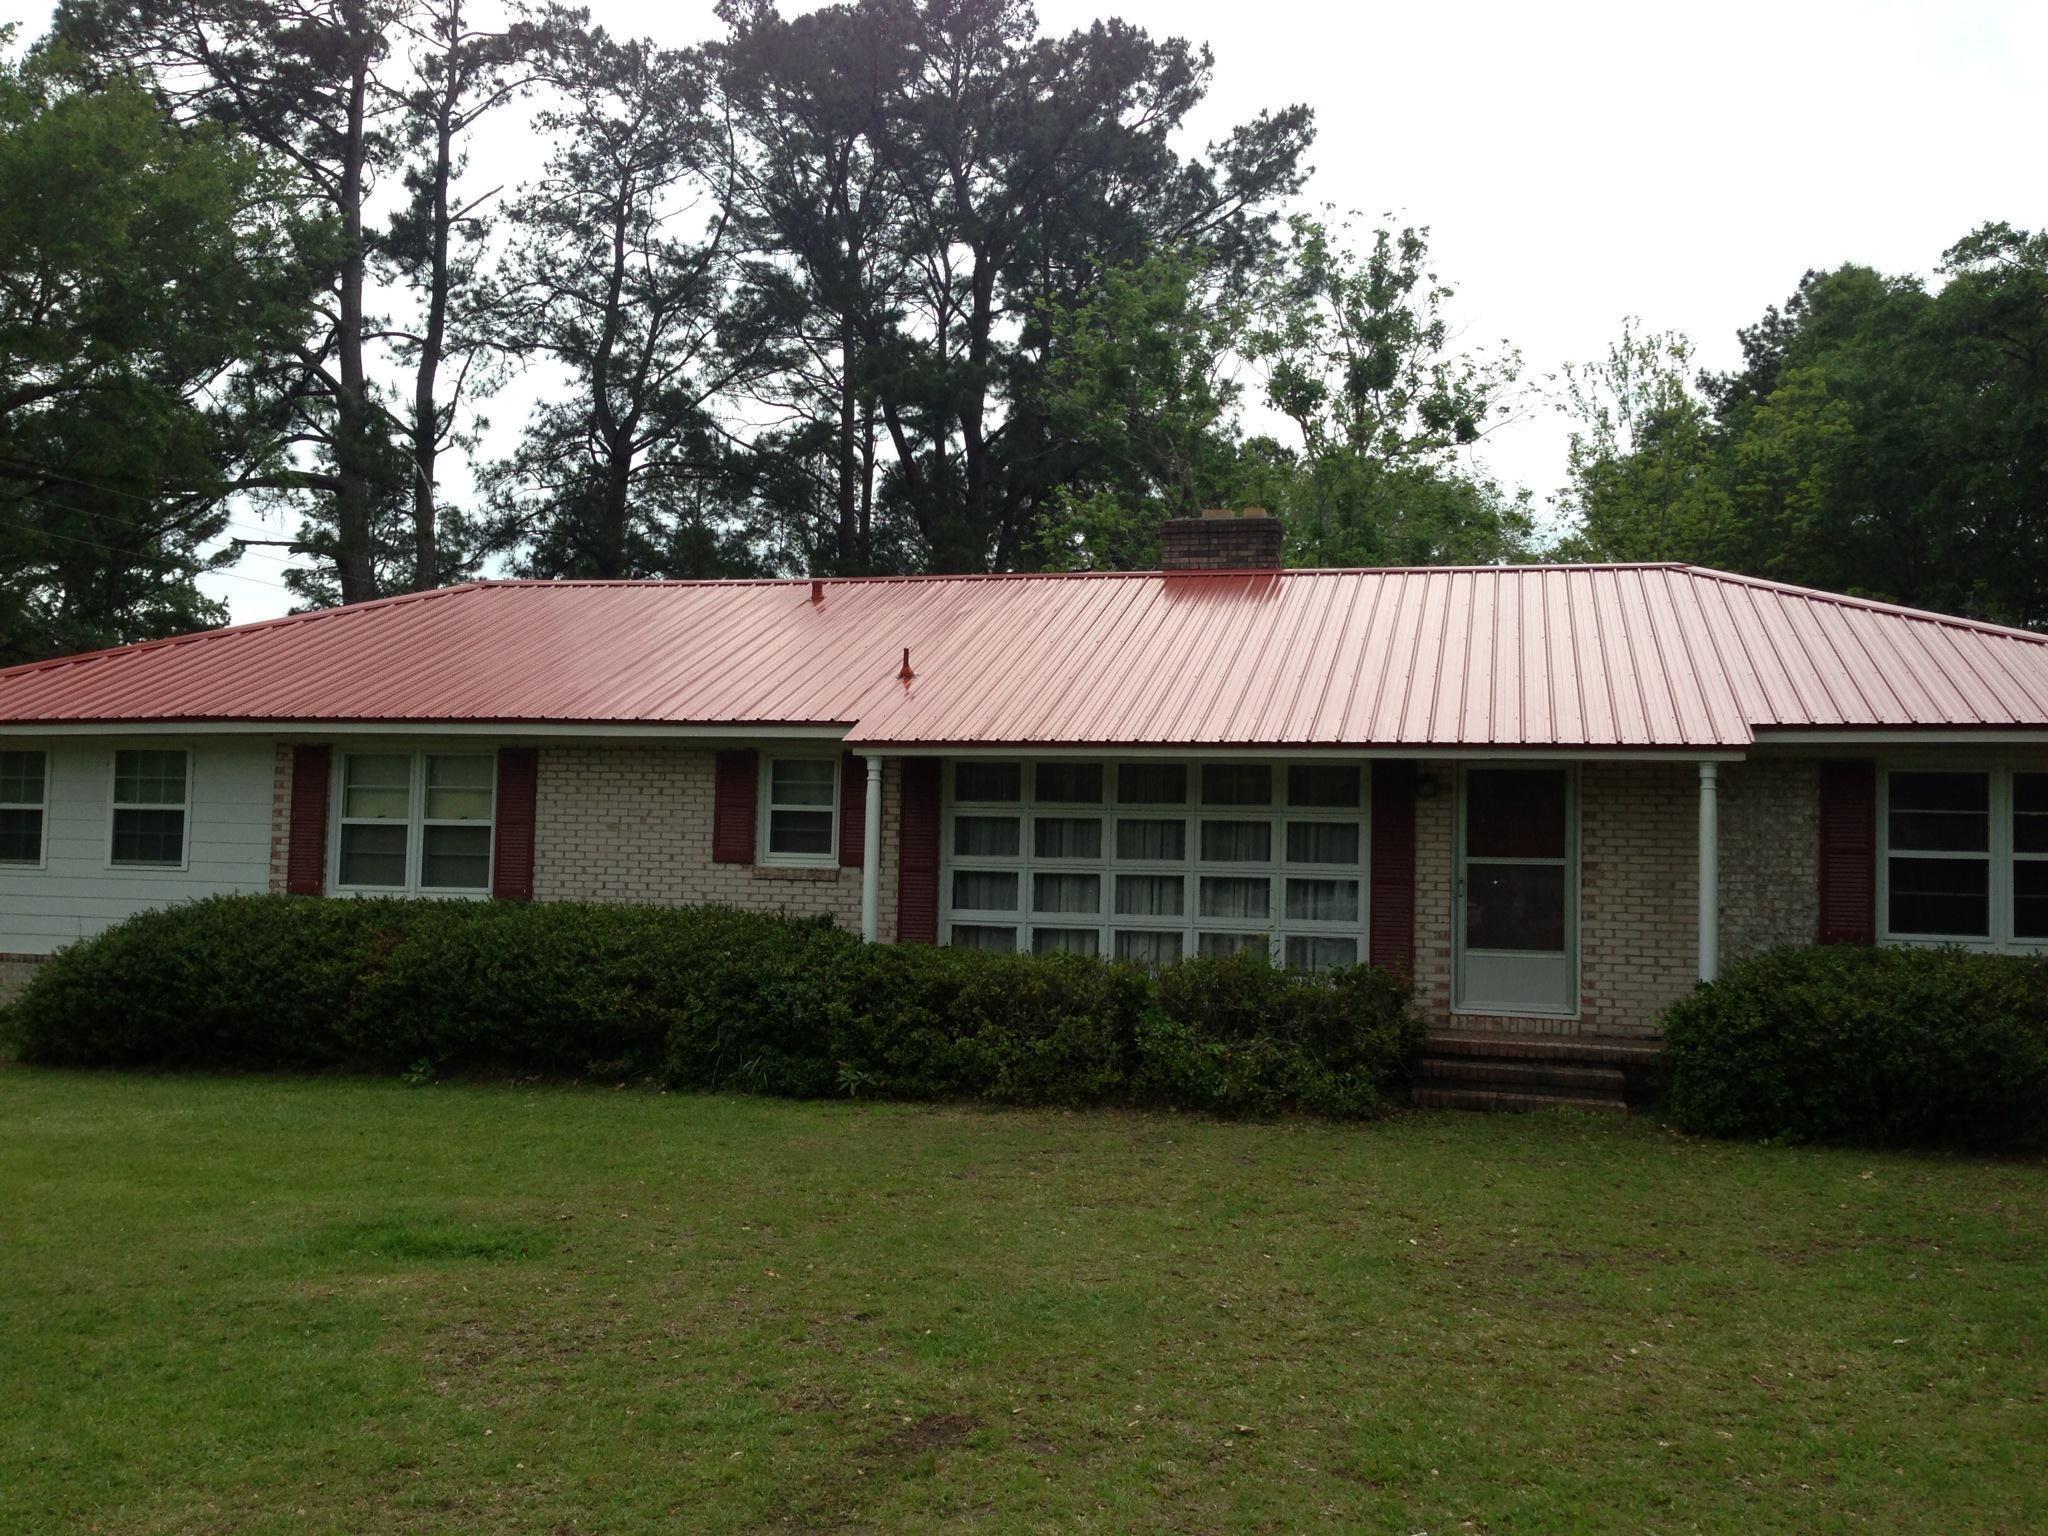 RoofCrafters-Savannah image 78